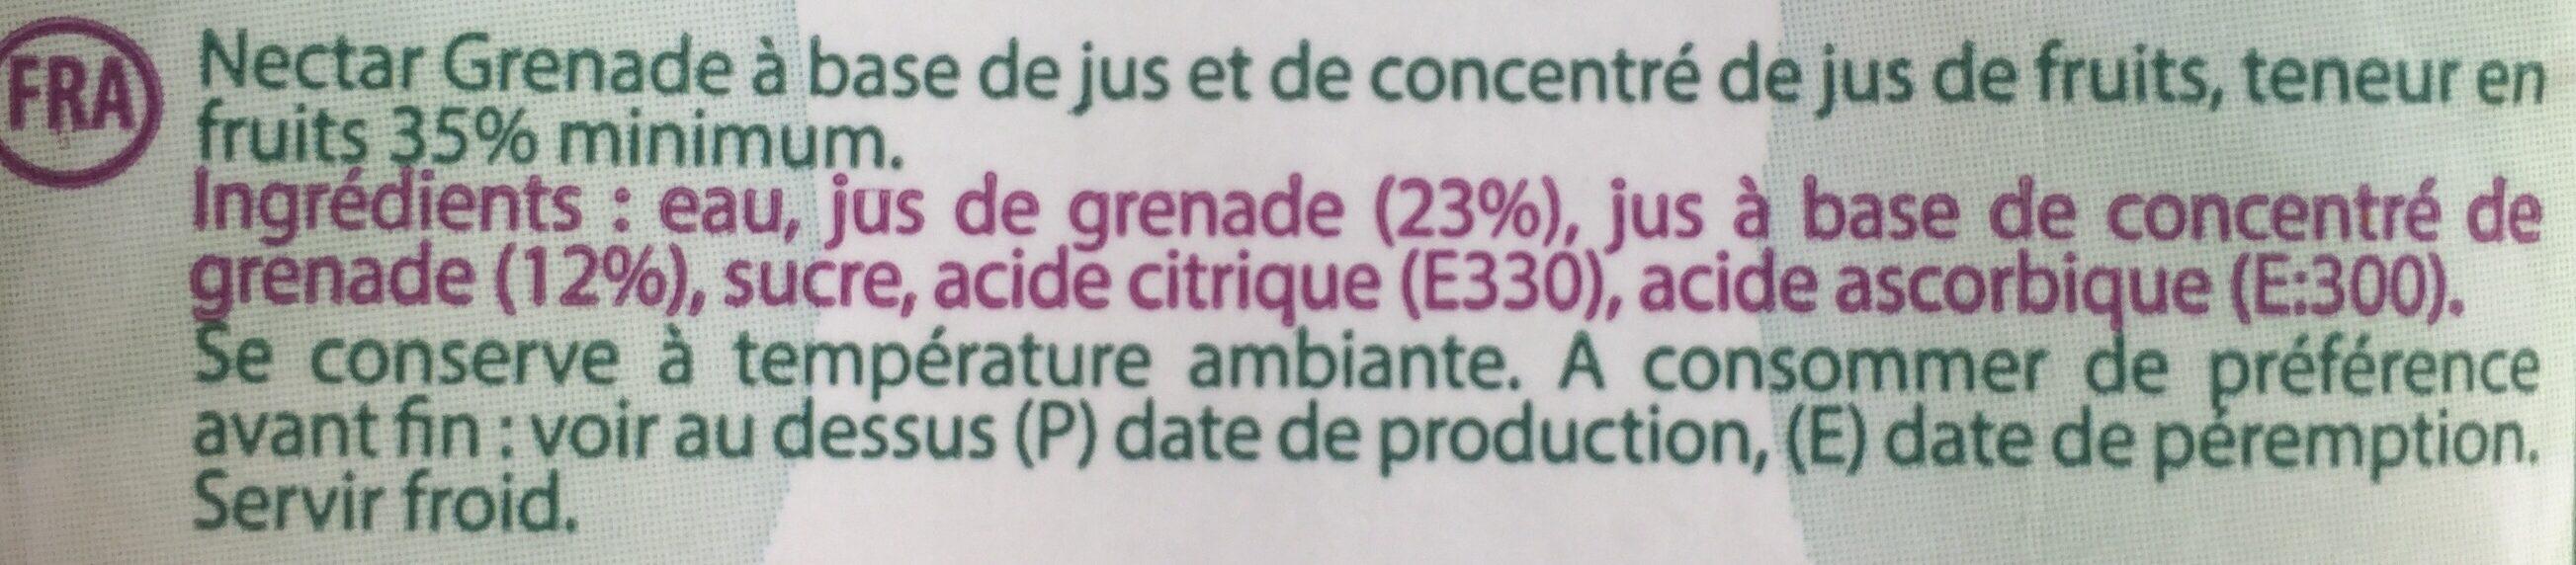 Nectar Grenade - Ingrédients - fr